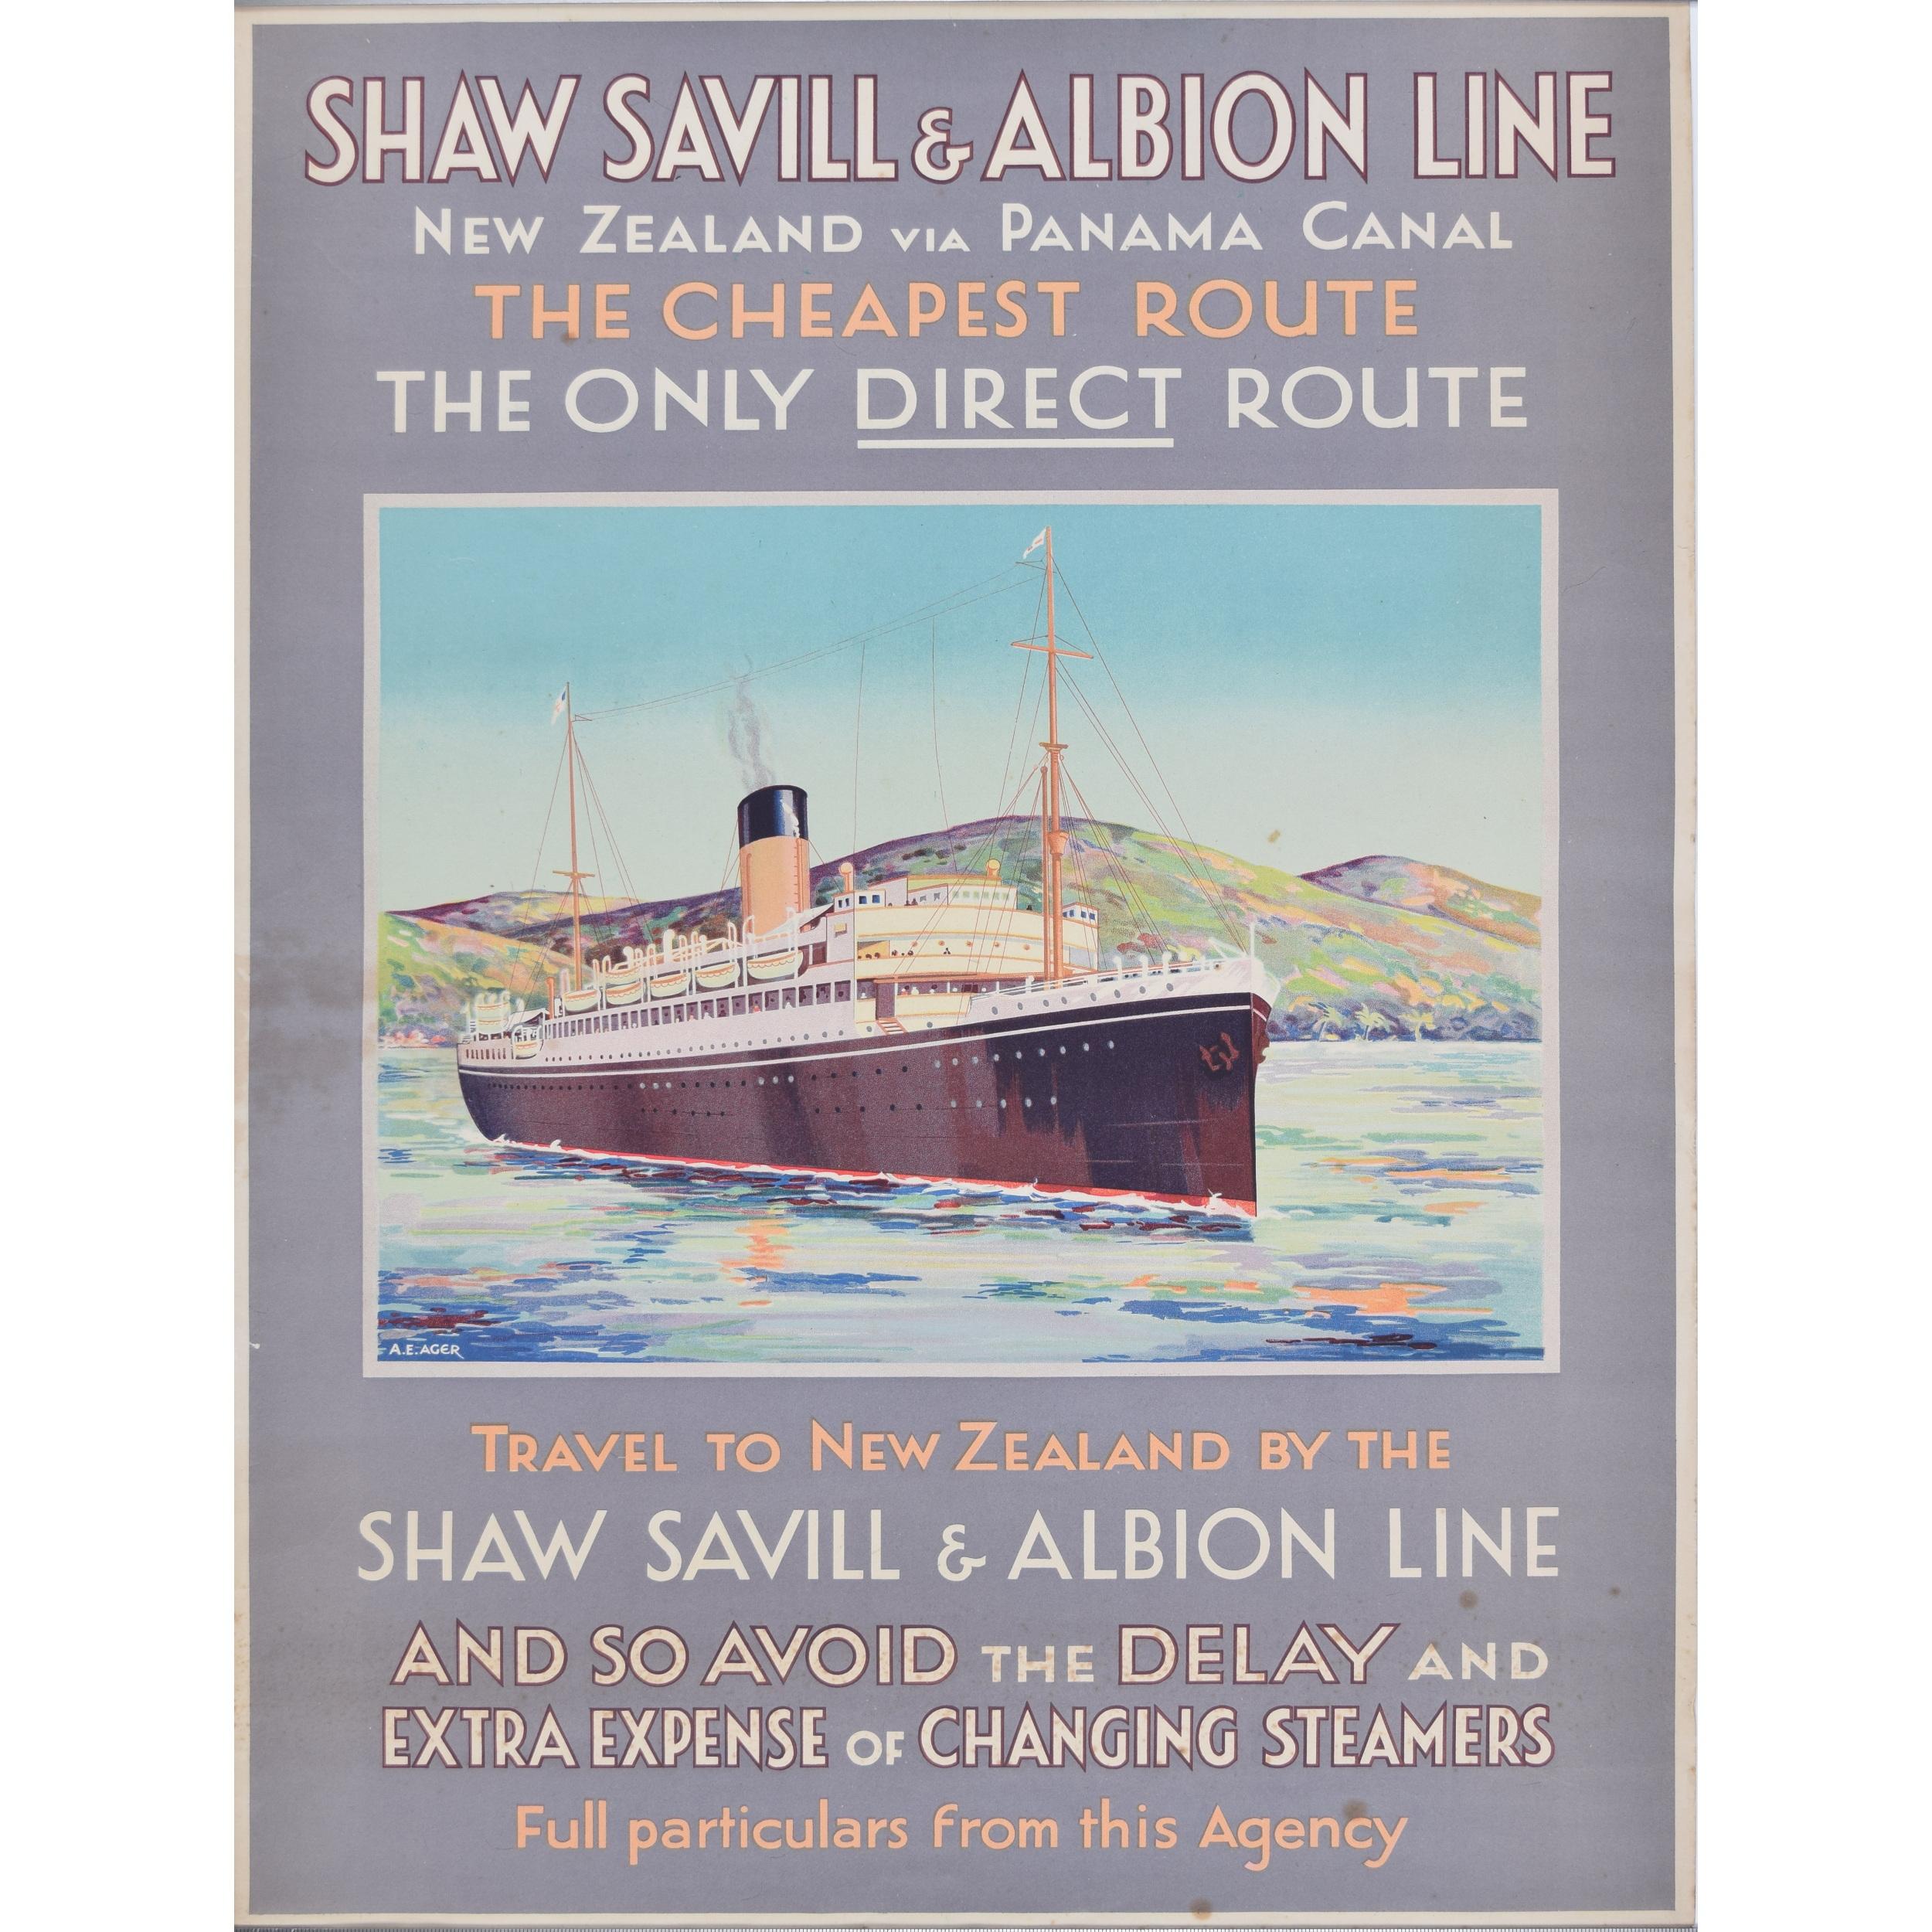 Shaw Savill Line by A E Agar poster Ocean Liners c1940s New Zealand via Panama